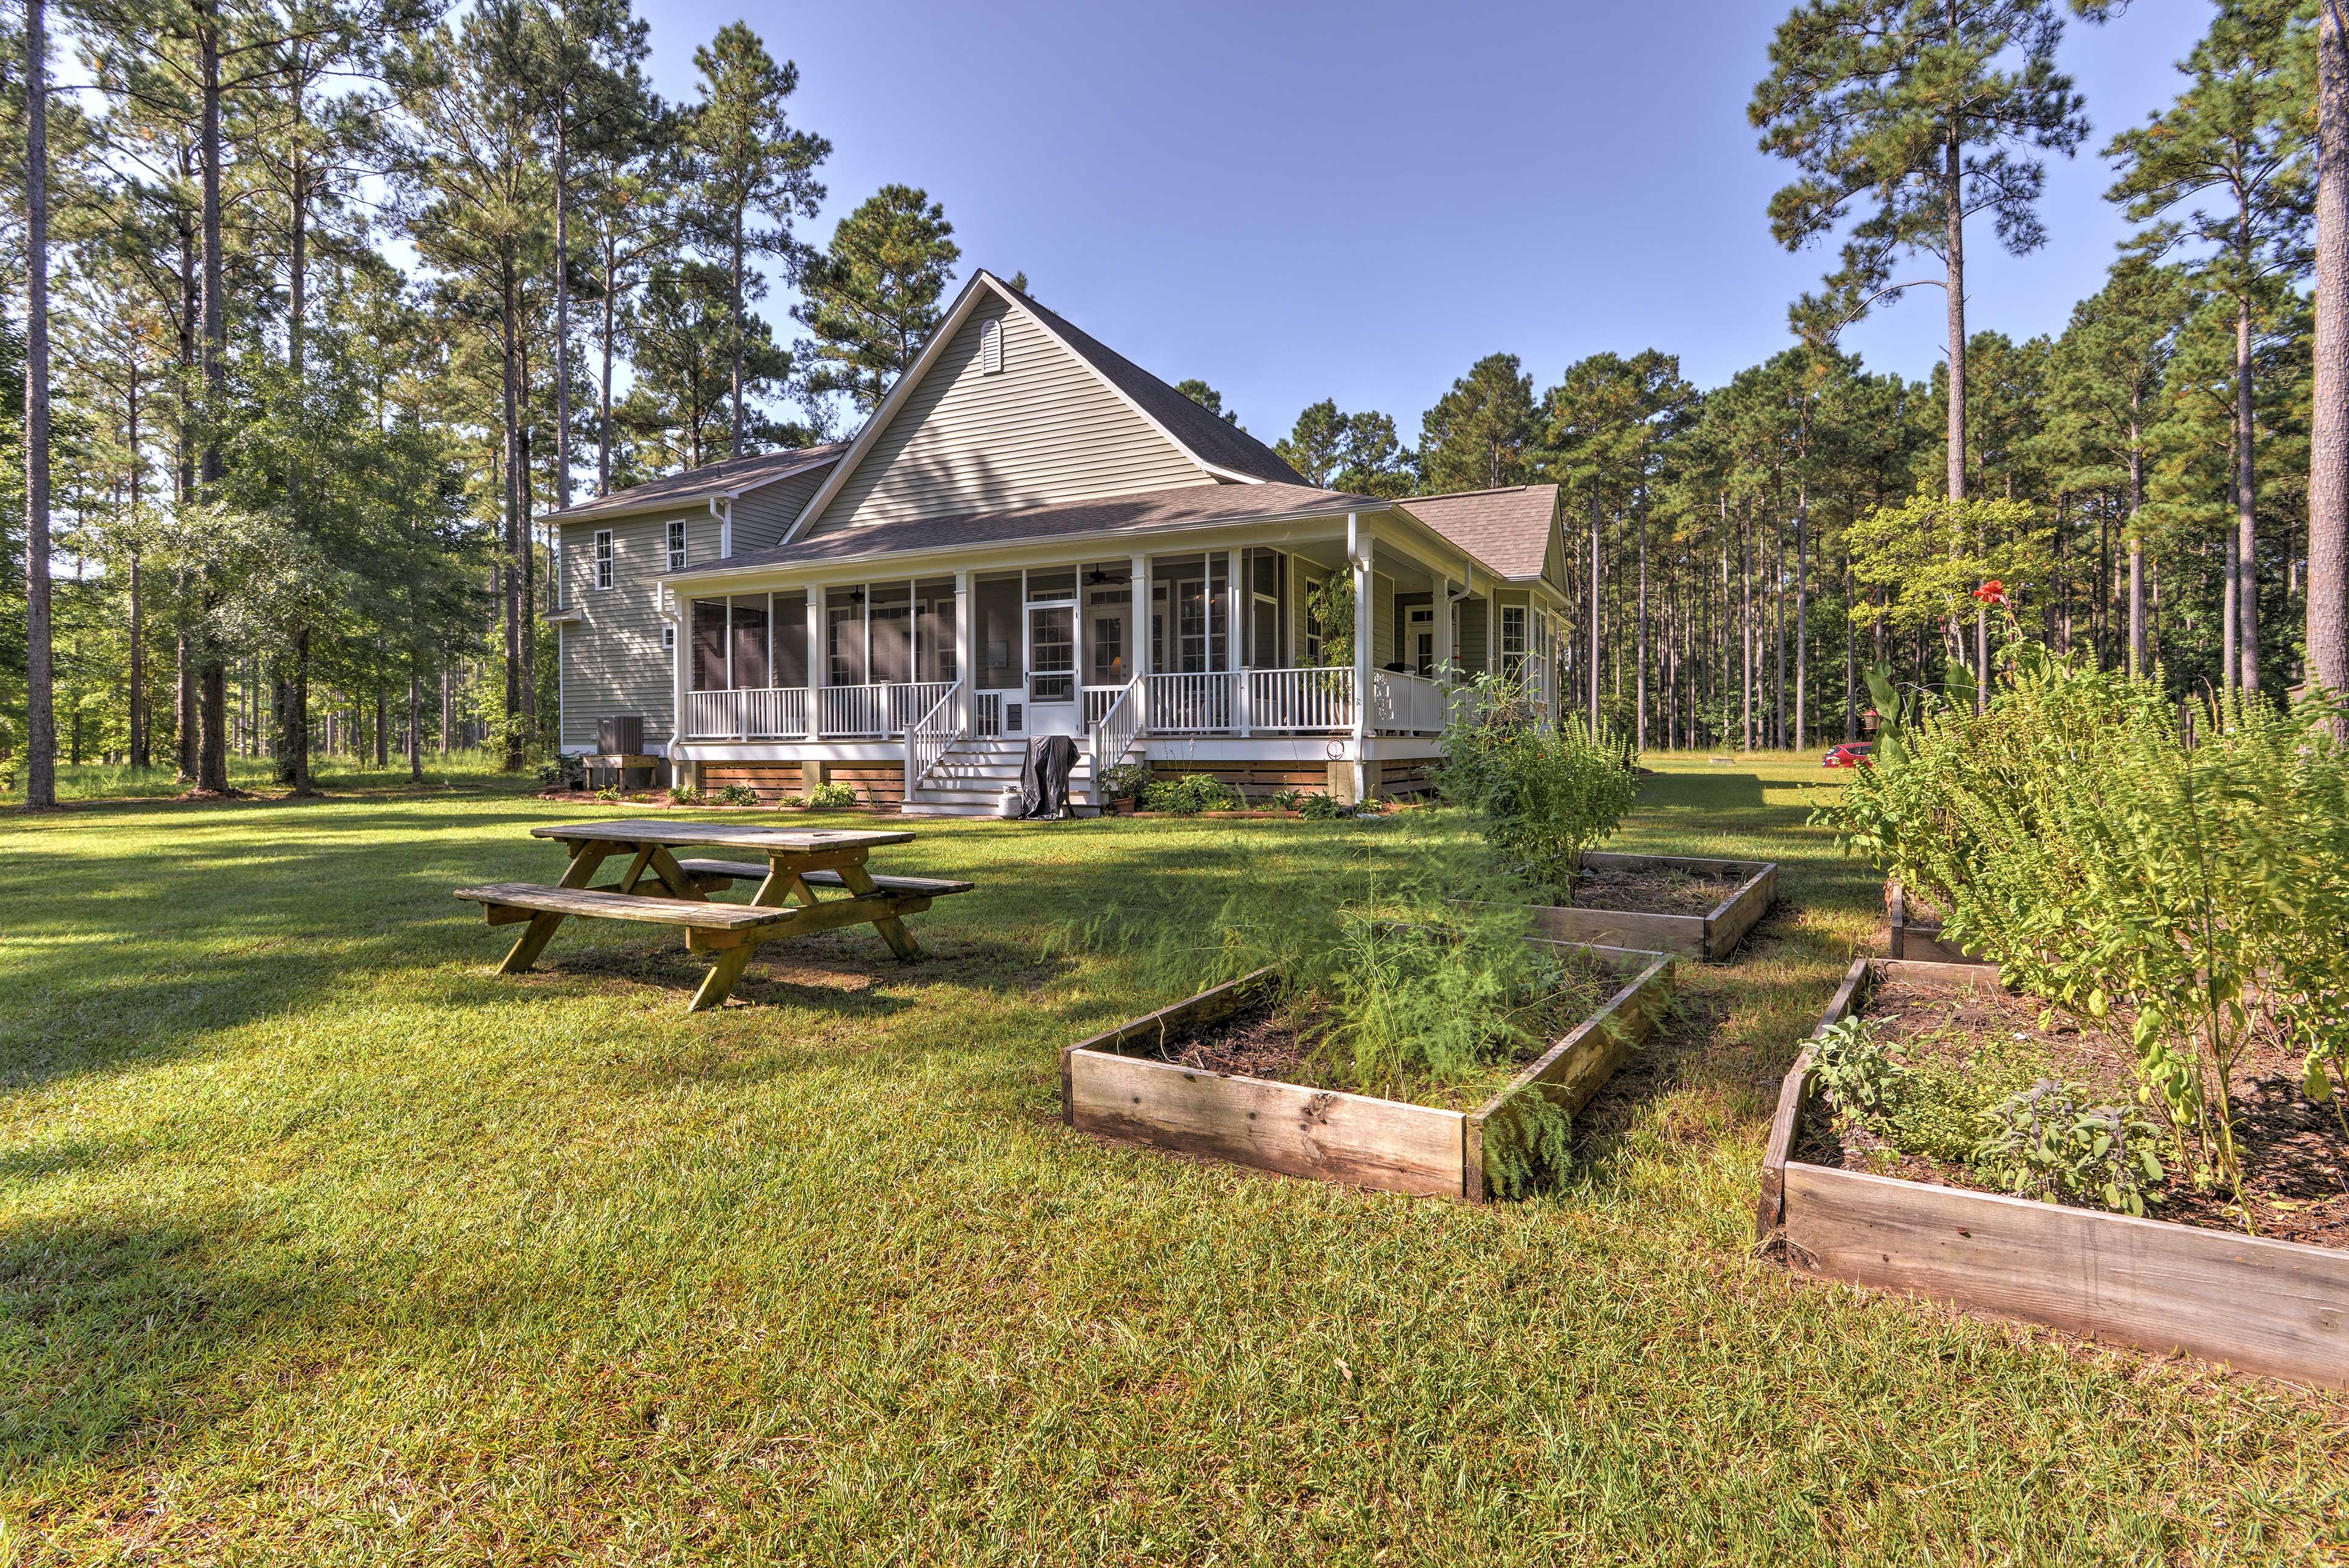 Enjoy an al fresco barbecue gathered around this outdoor picnic table.